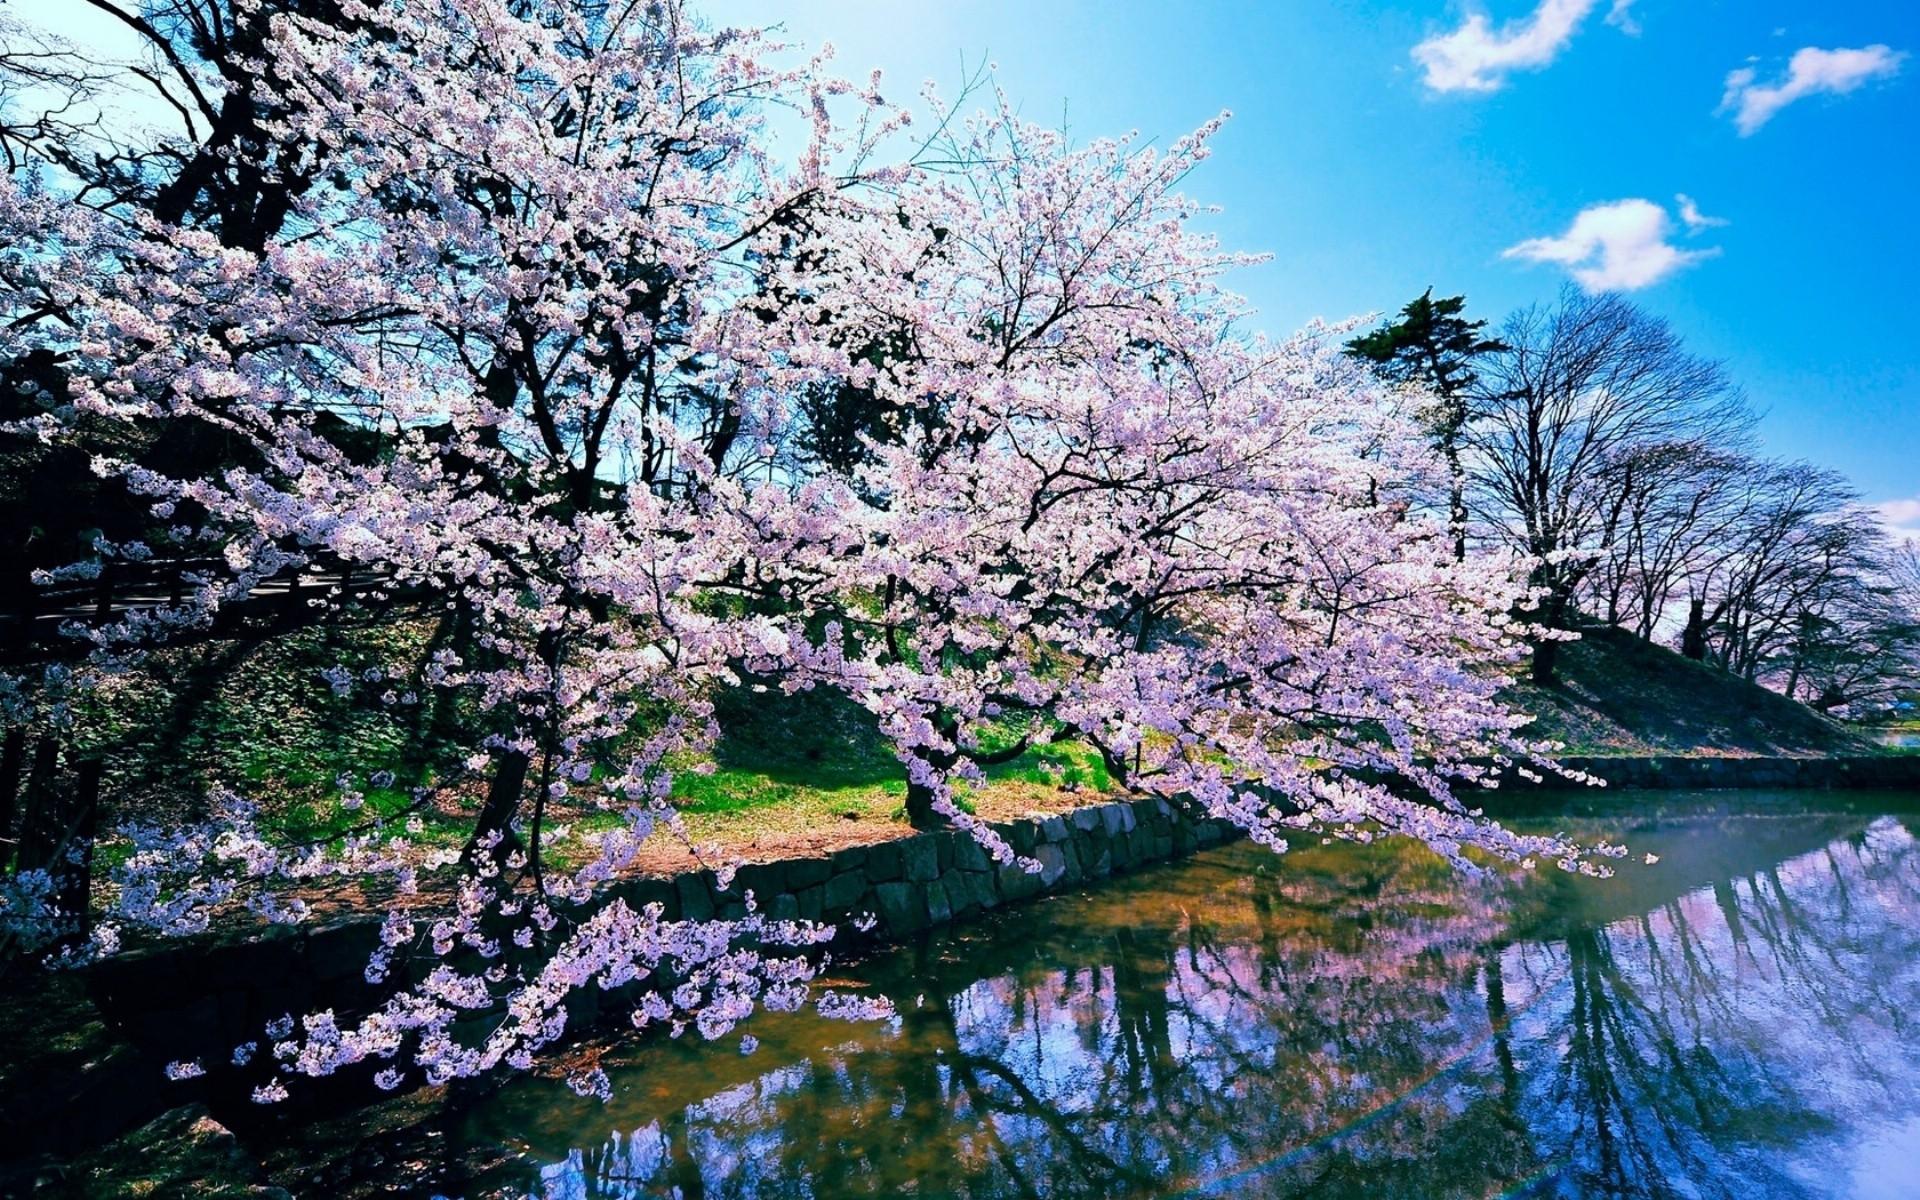 japan landscapes nature cherry blossoms wallpaper 1920x1200 184176 wallpaperup. Black Bedroom Furniture Sets. Home Design Ideas